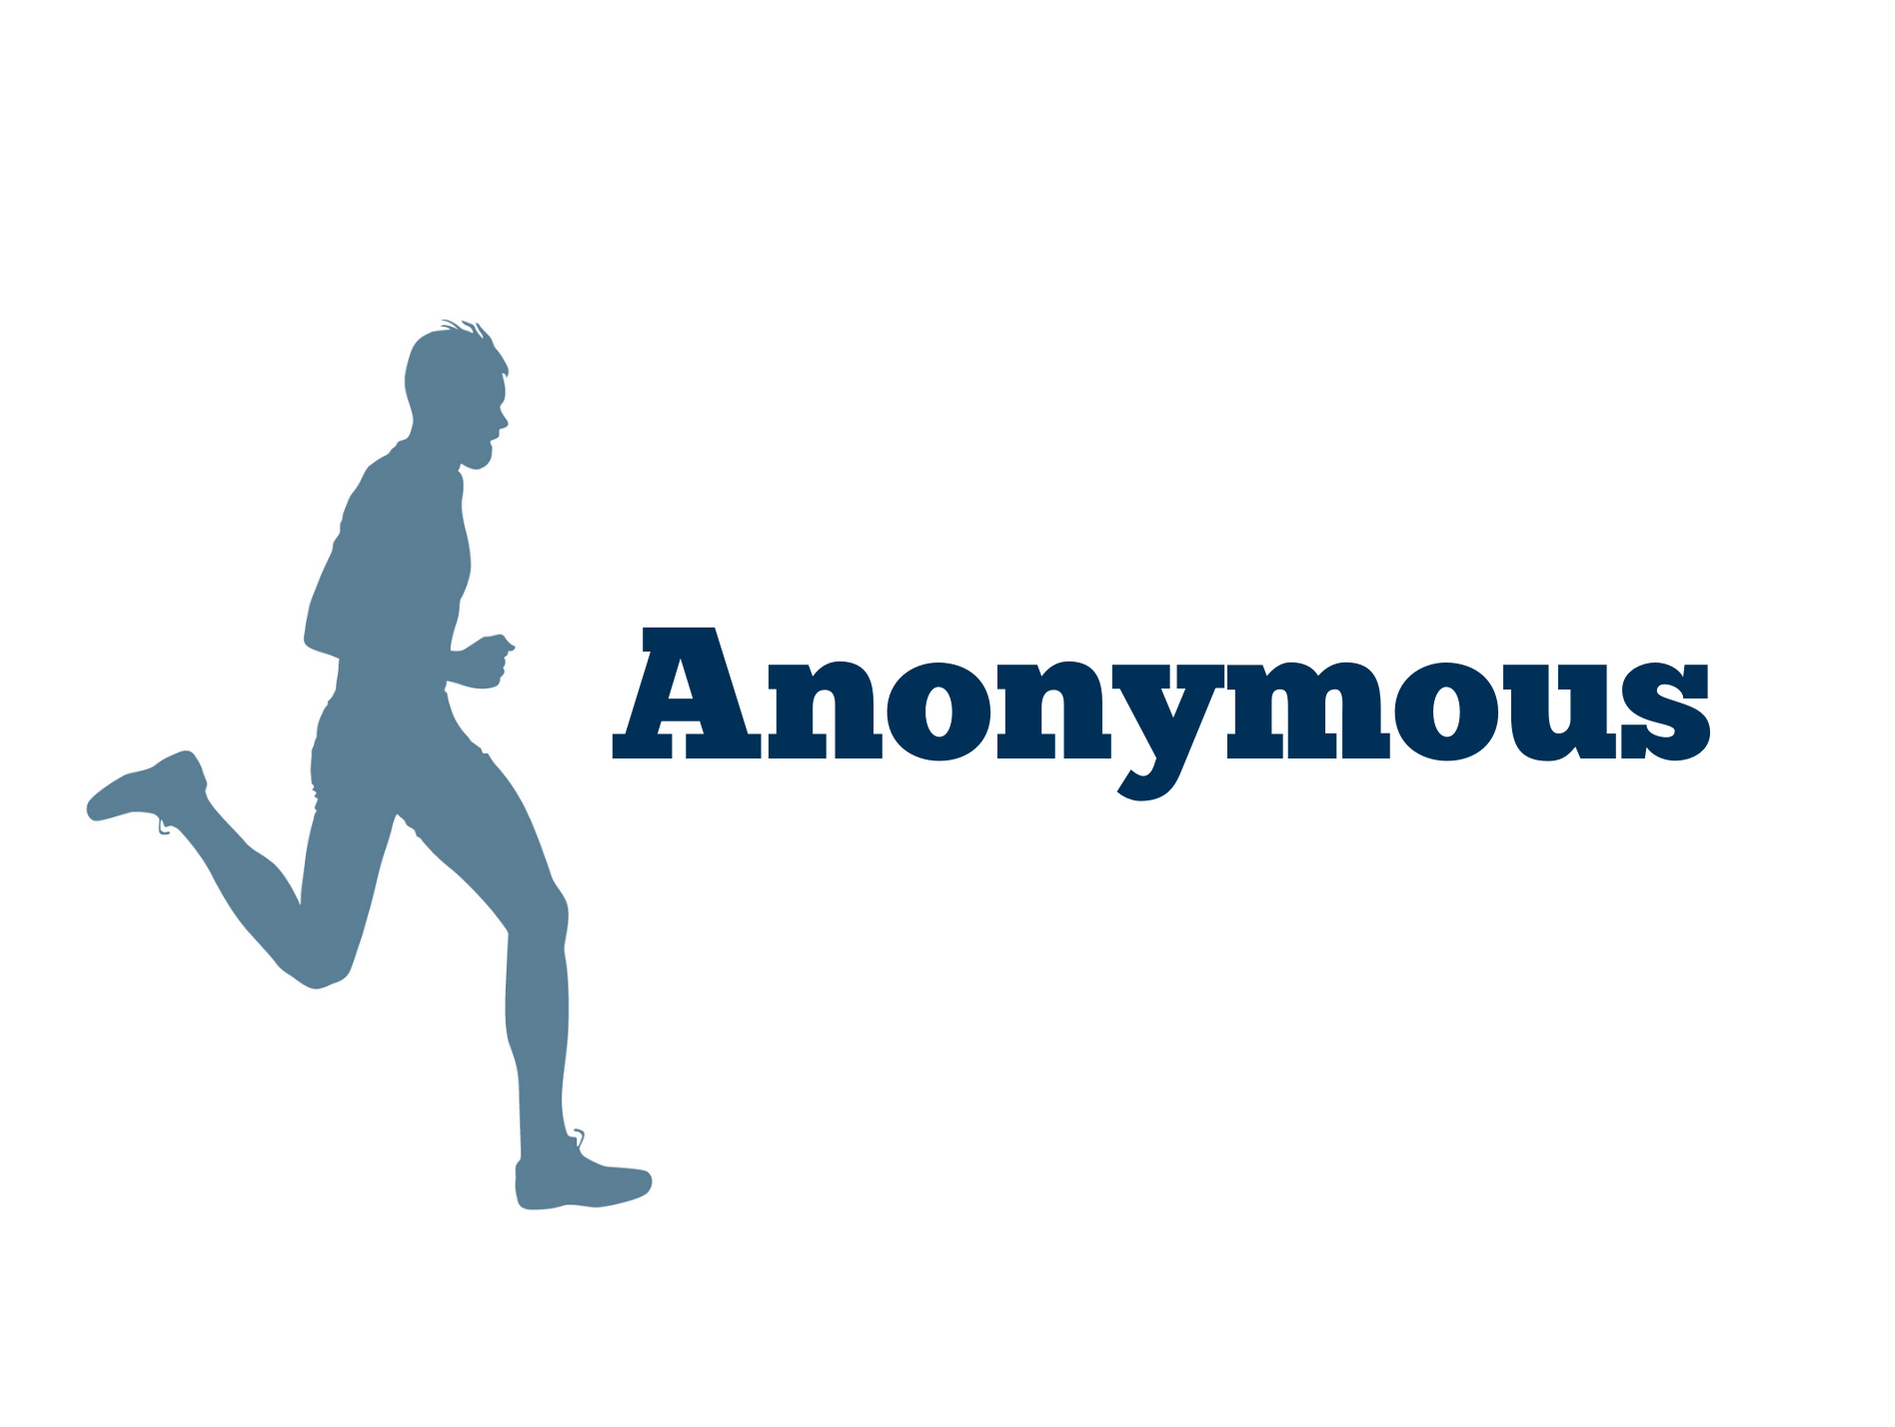 Anoynymous